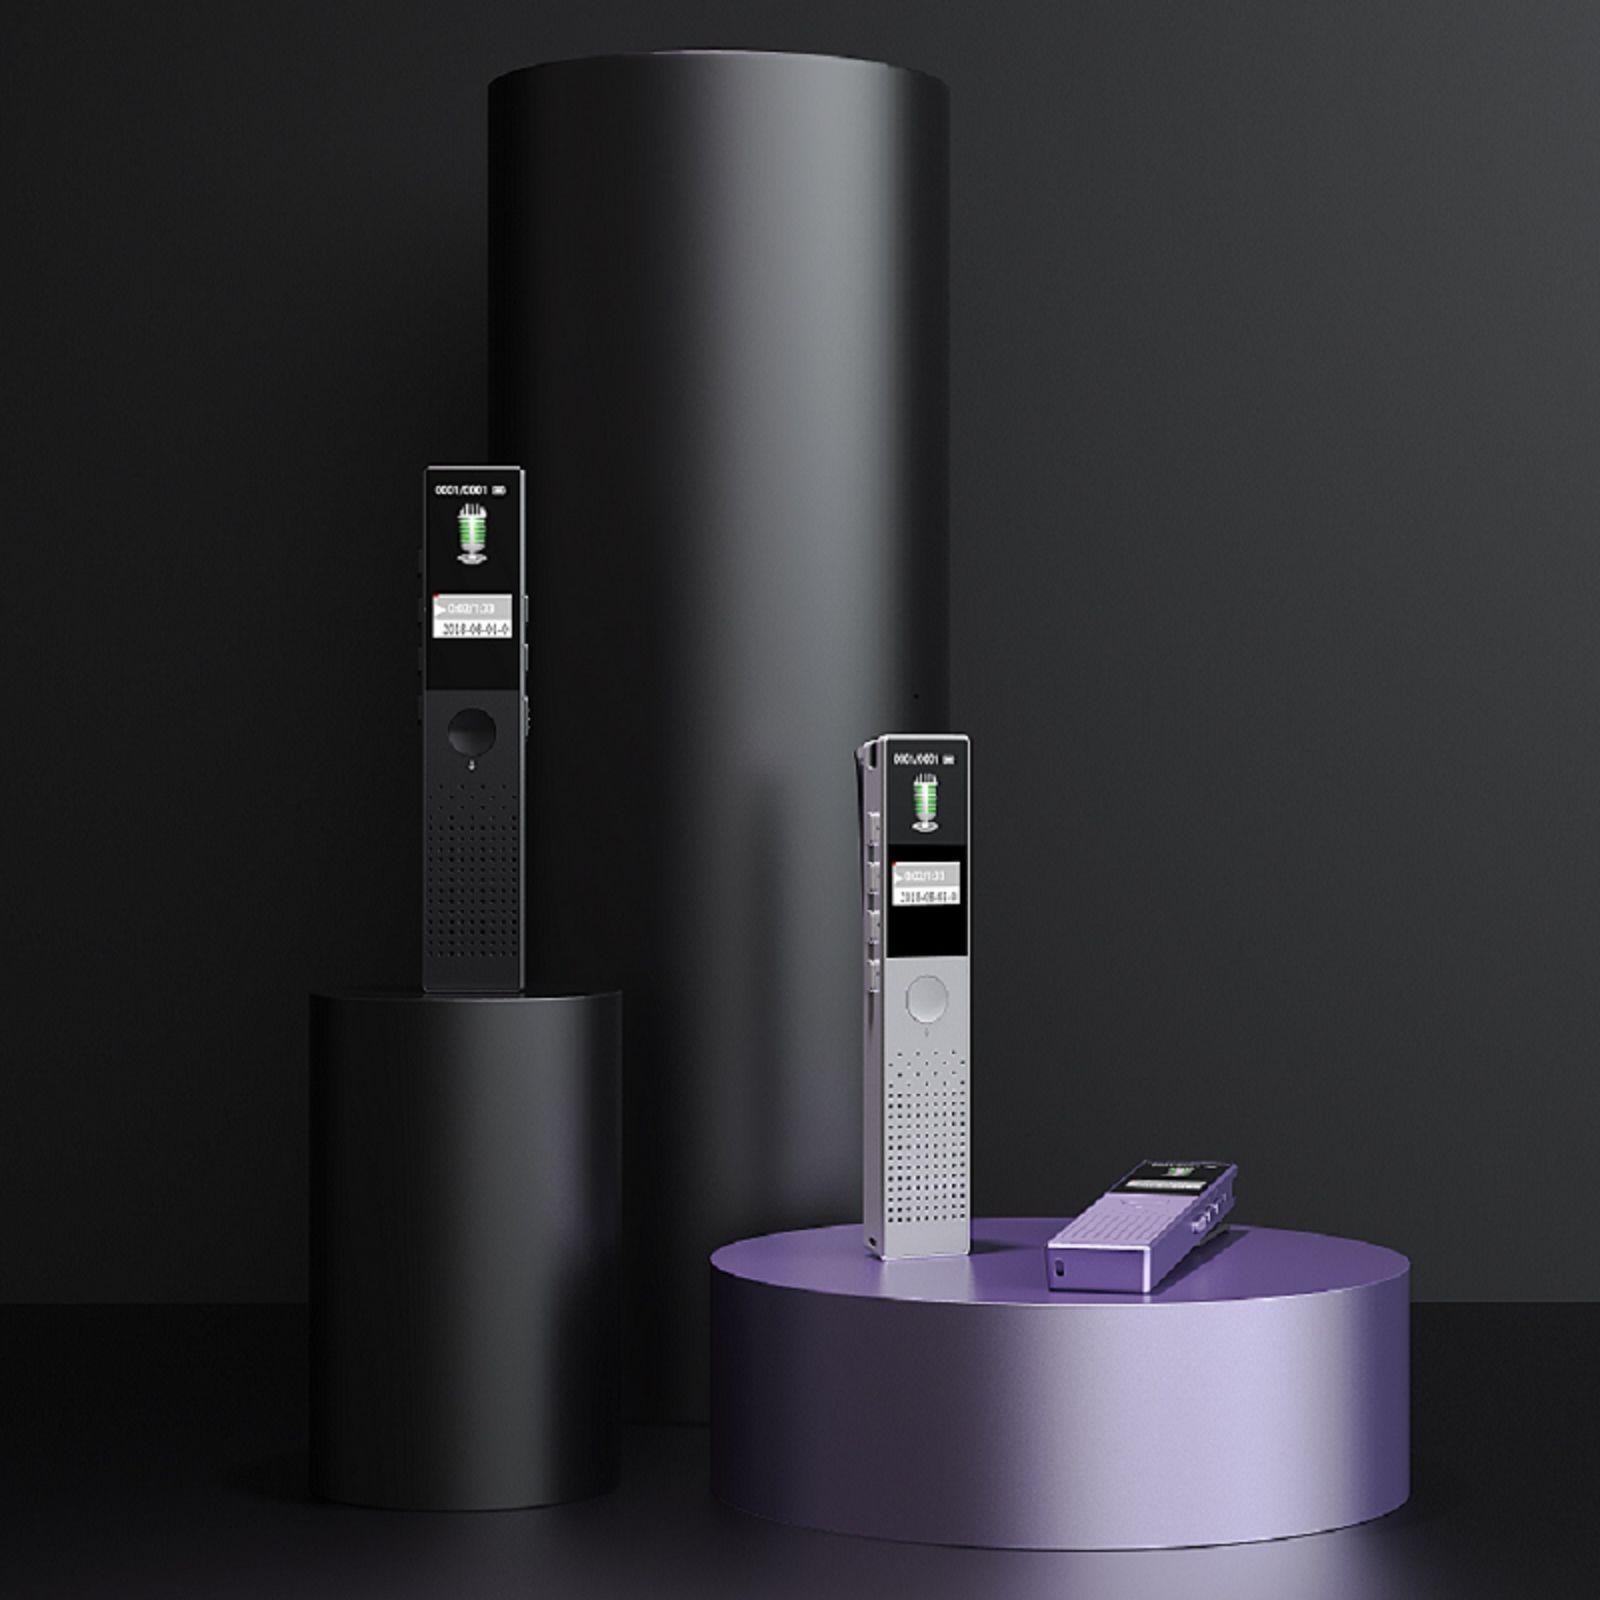 Цифровой рекордер Yiguo N8 с поддержкой MP3-плеера и USB-флеш-памяти